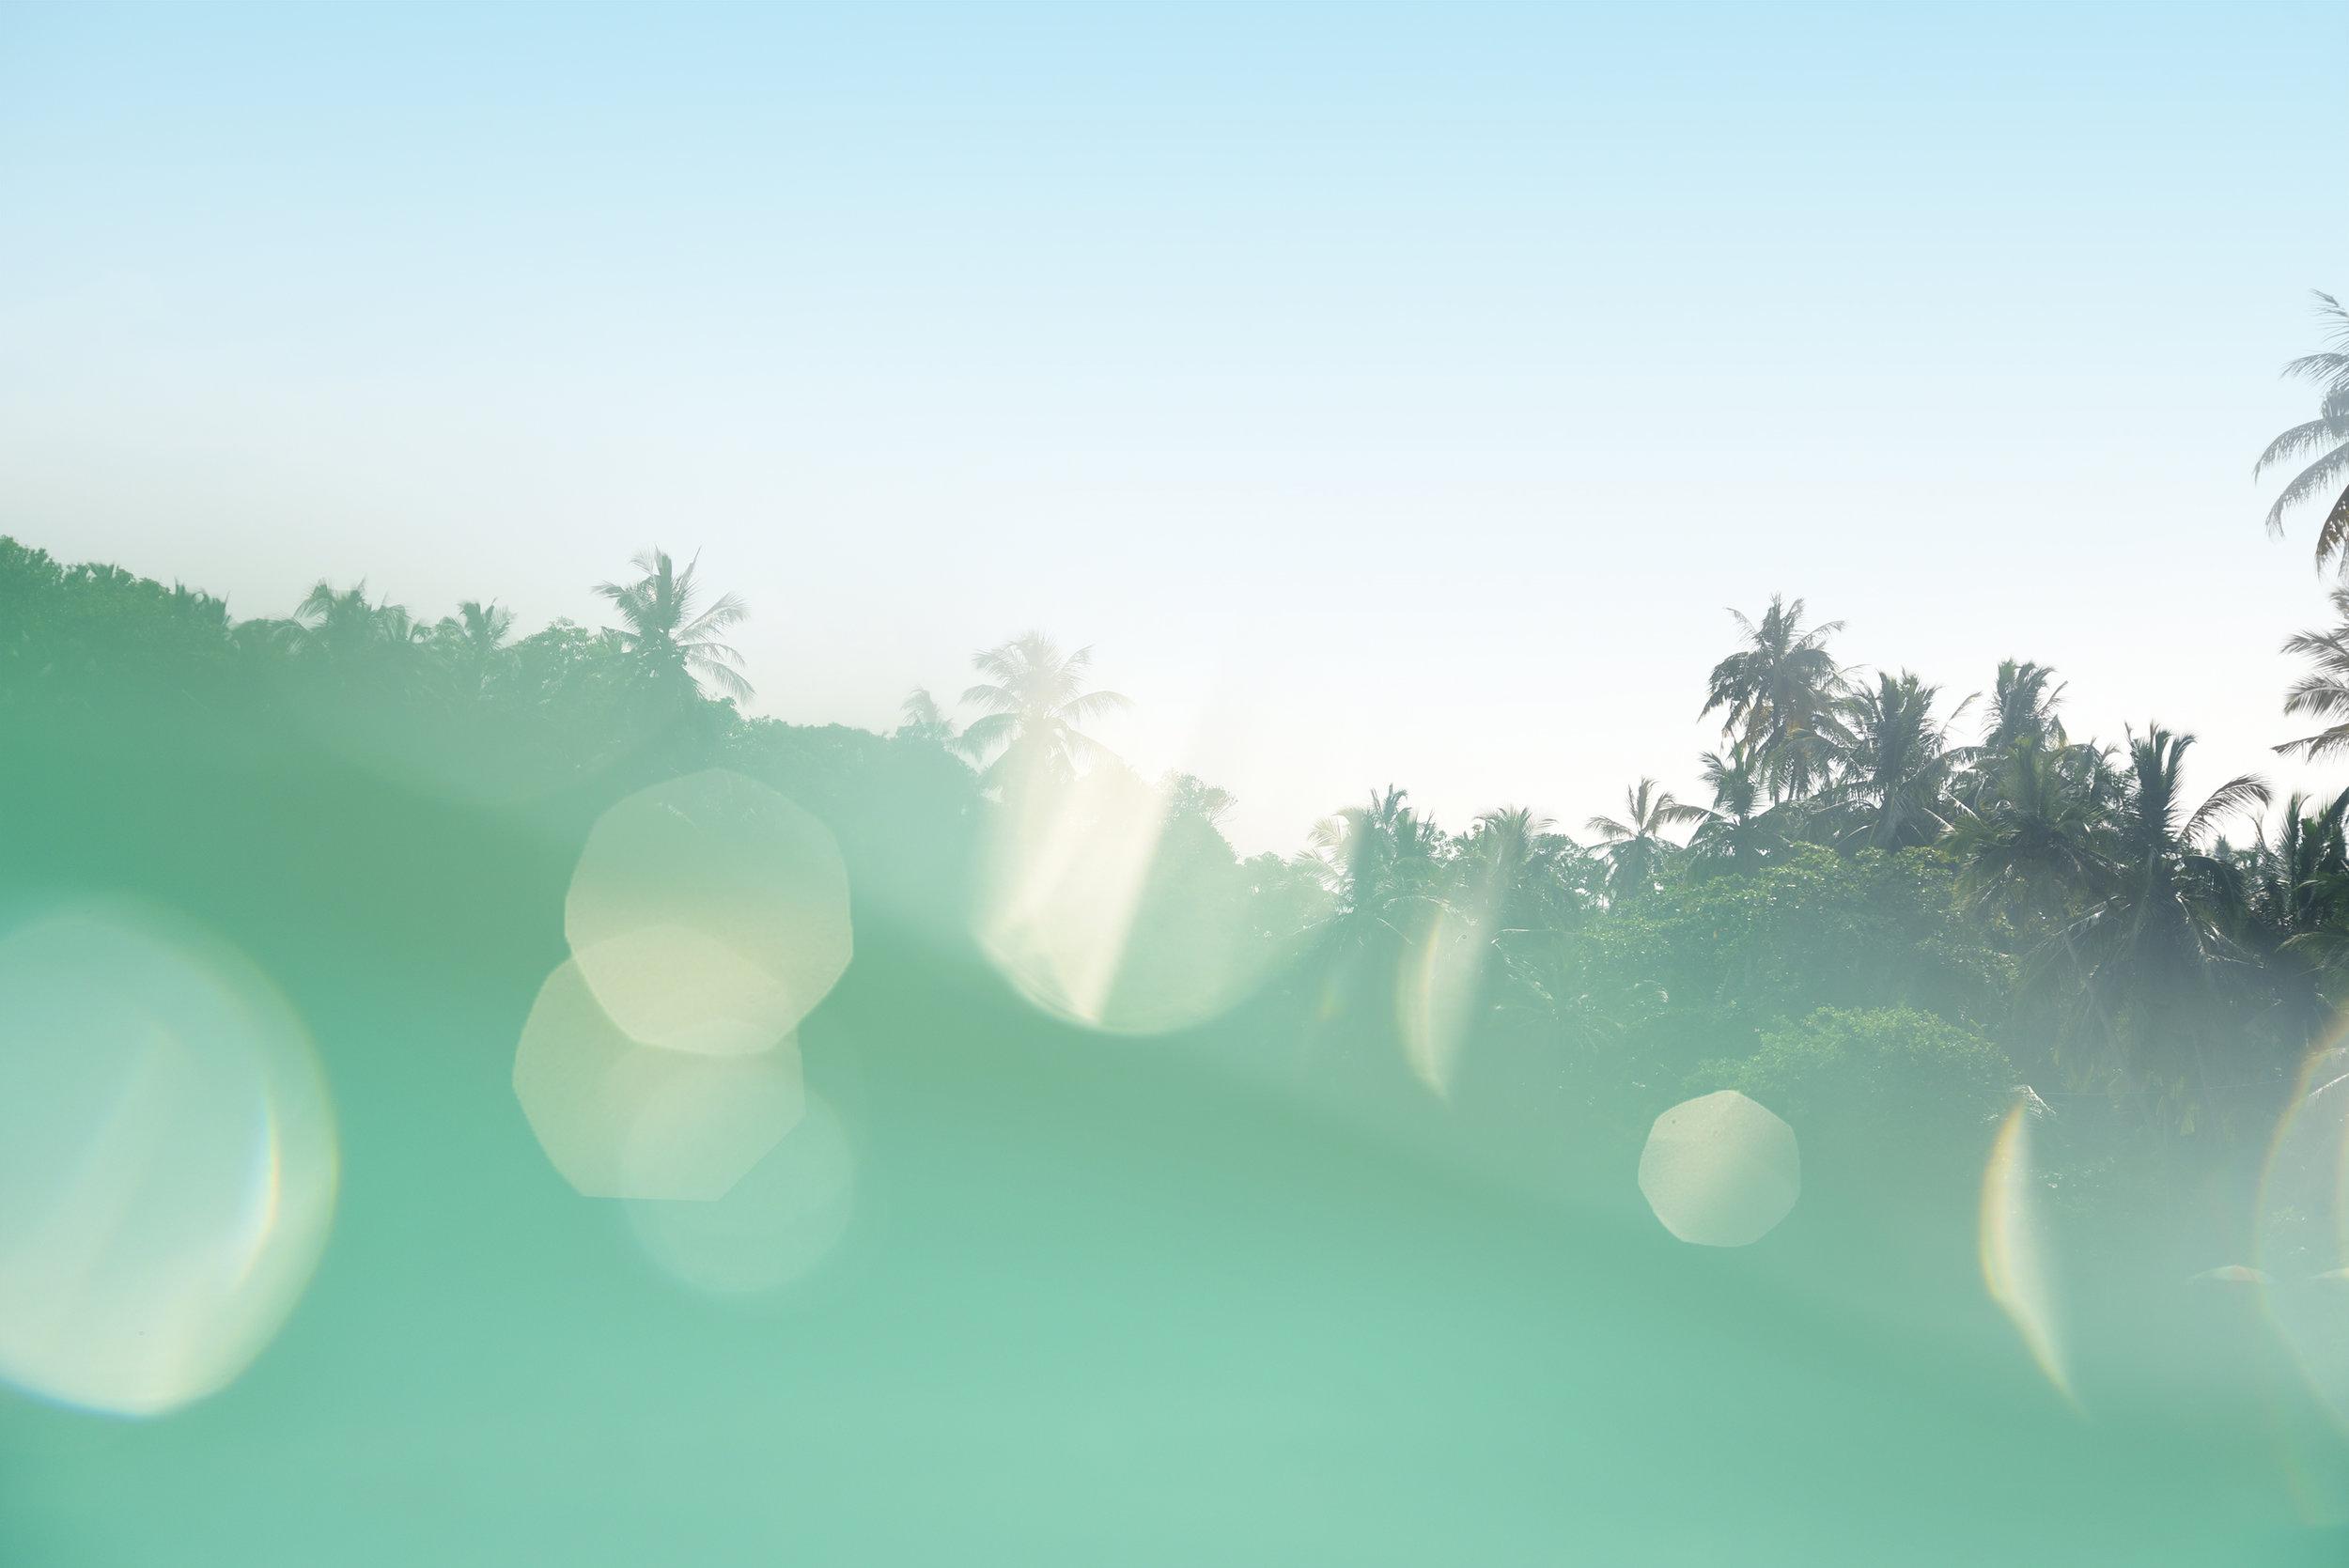 Bokeh Sri Lanka beachscape